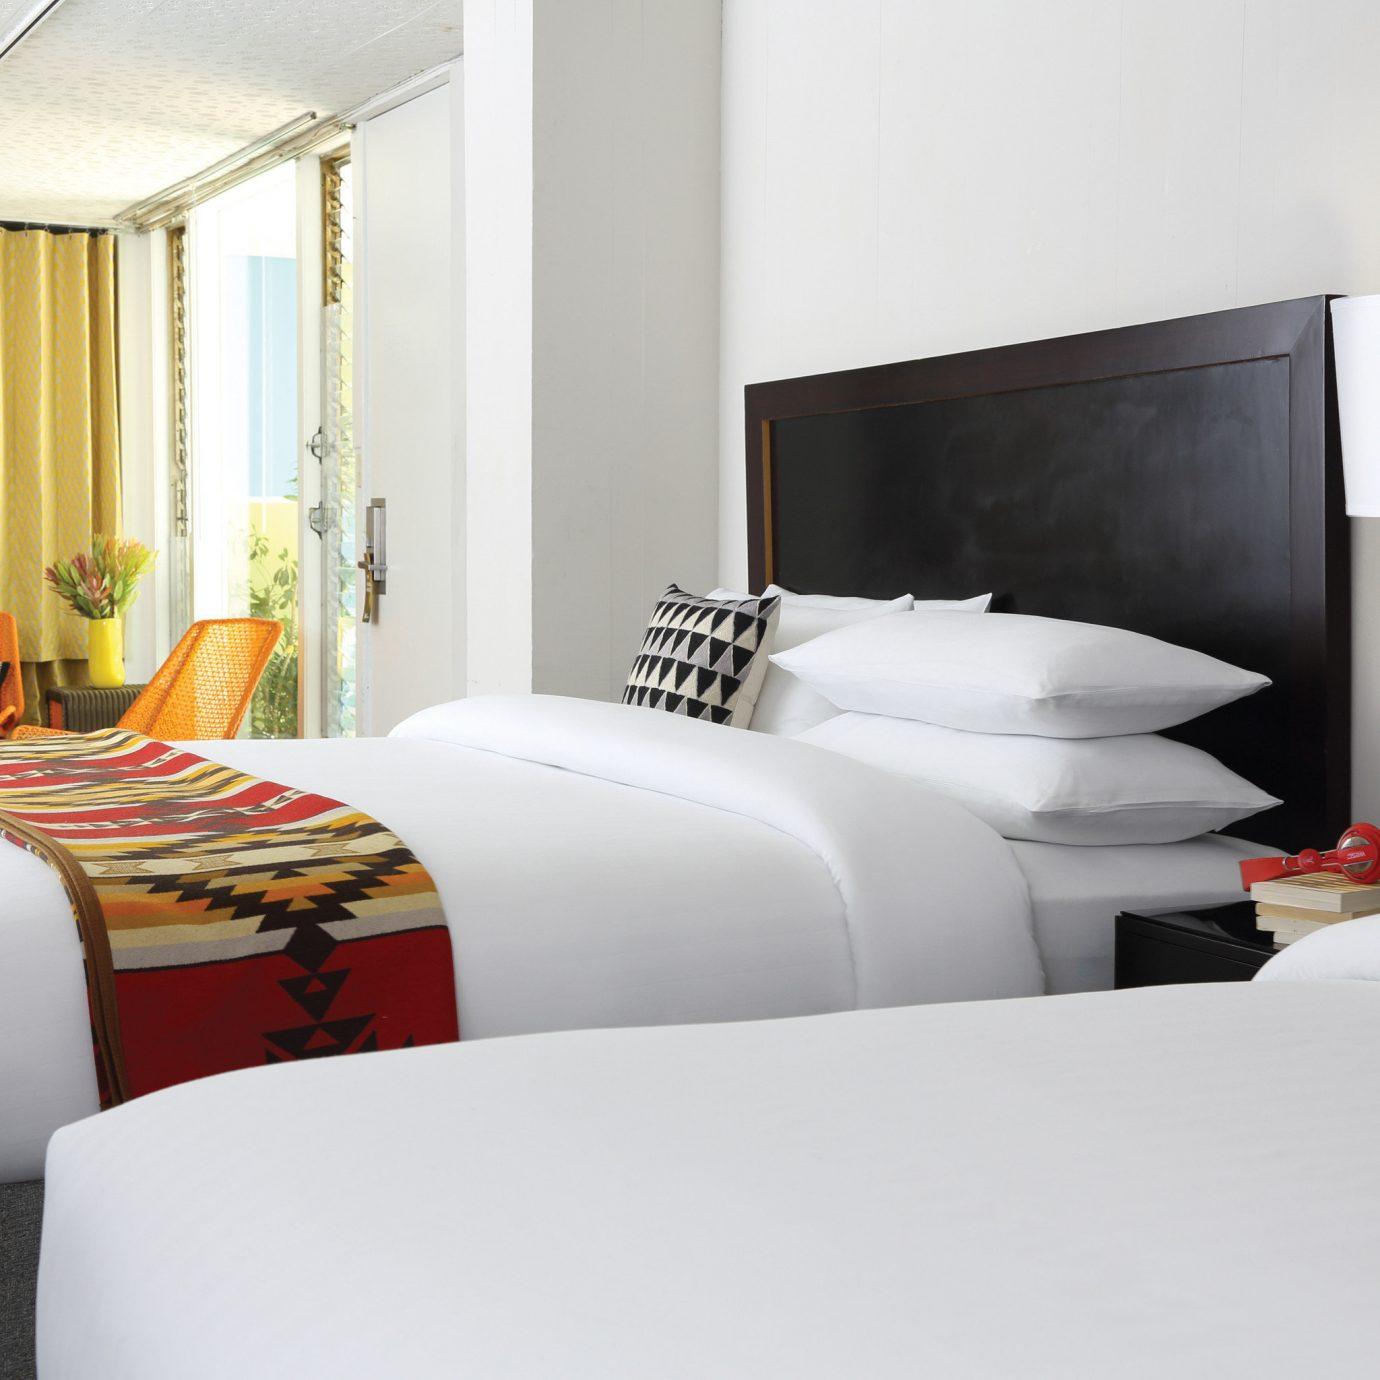 sofa property Bedroom pillow bed sheet home bed frame duvet cover Suite living room textile